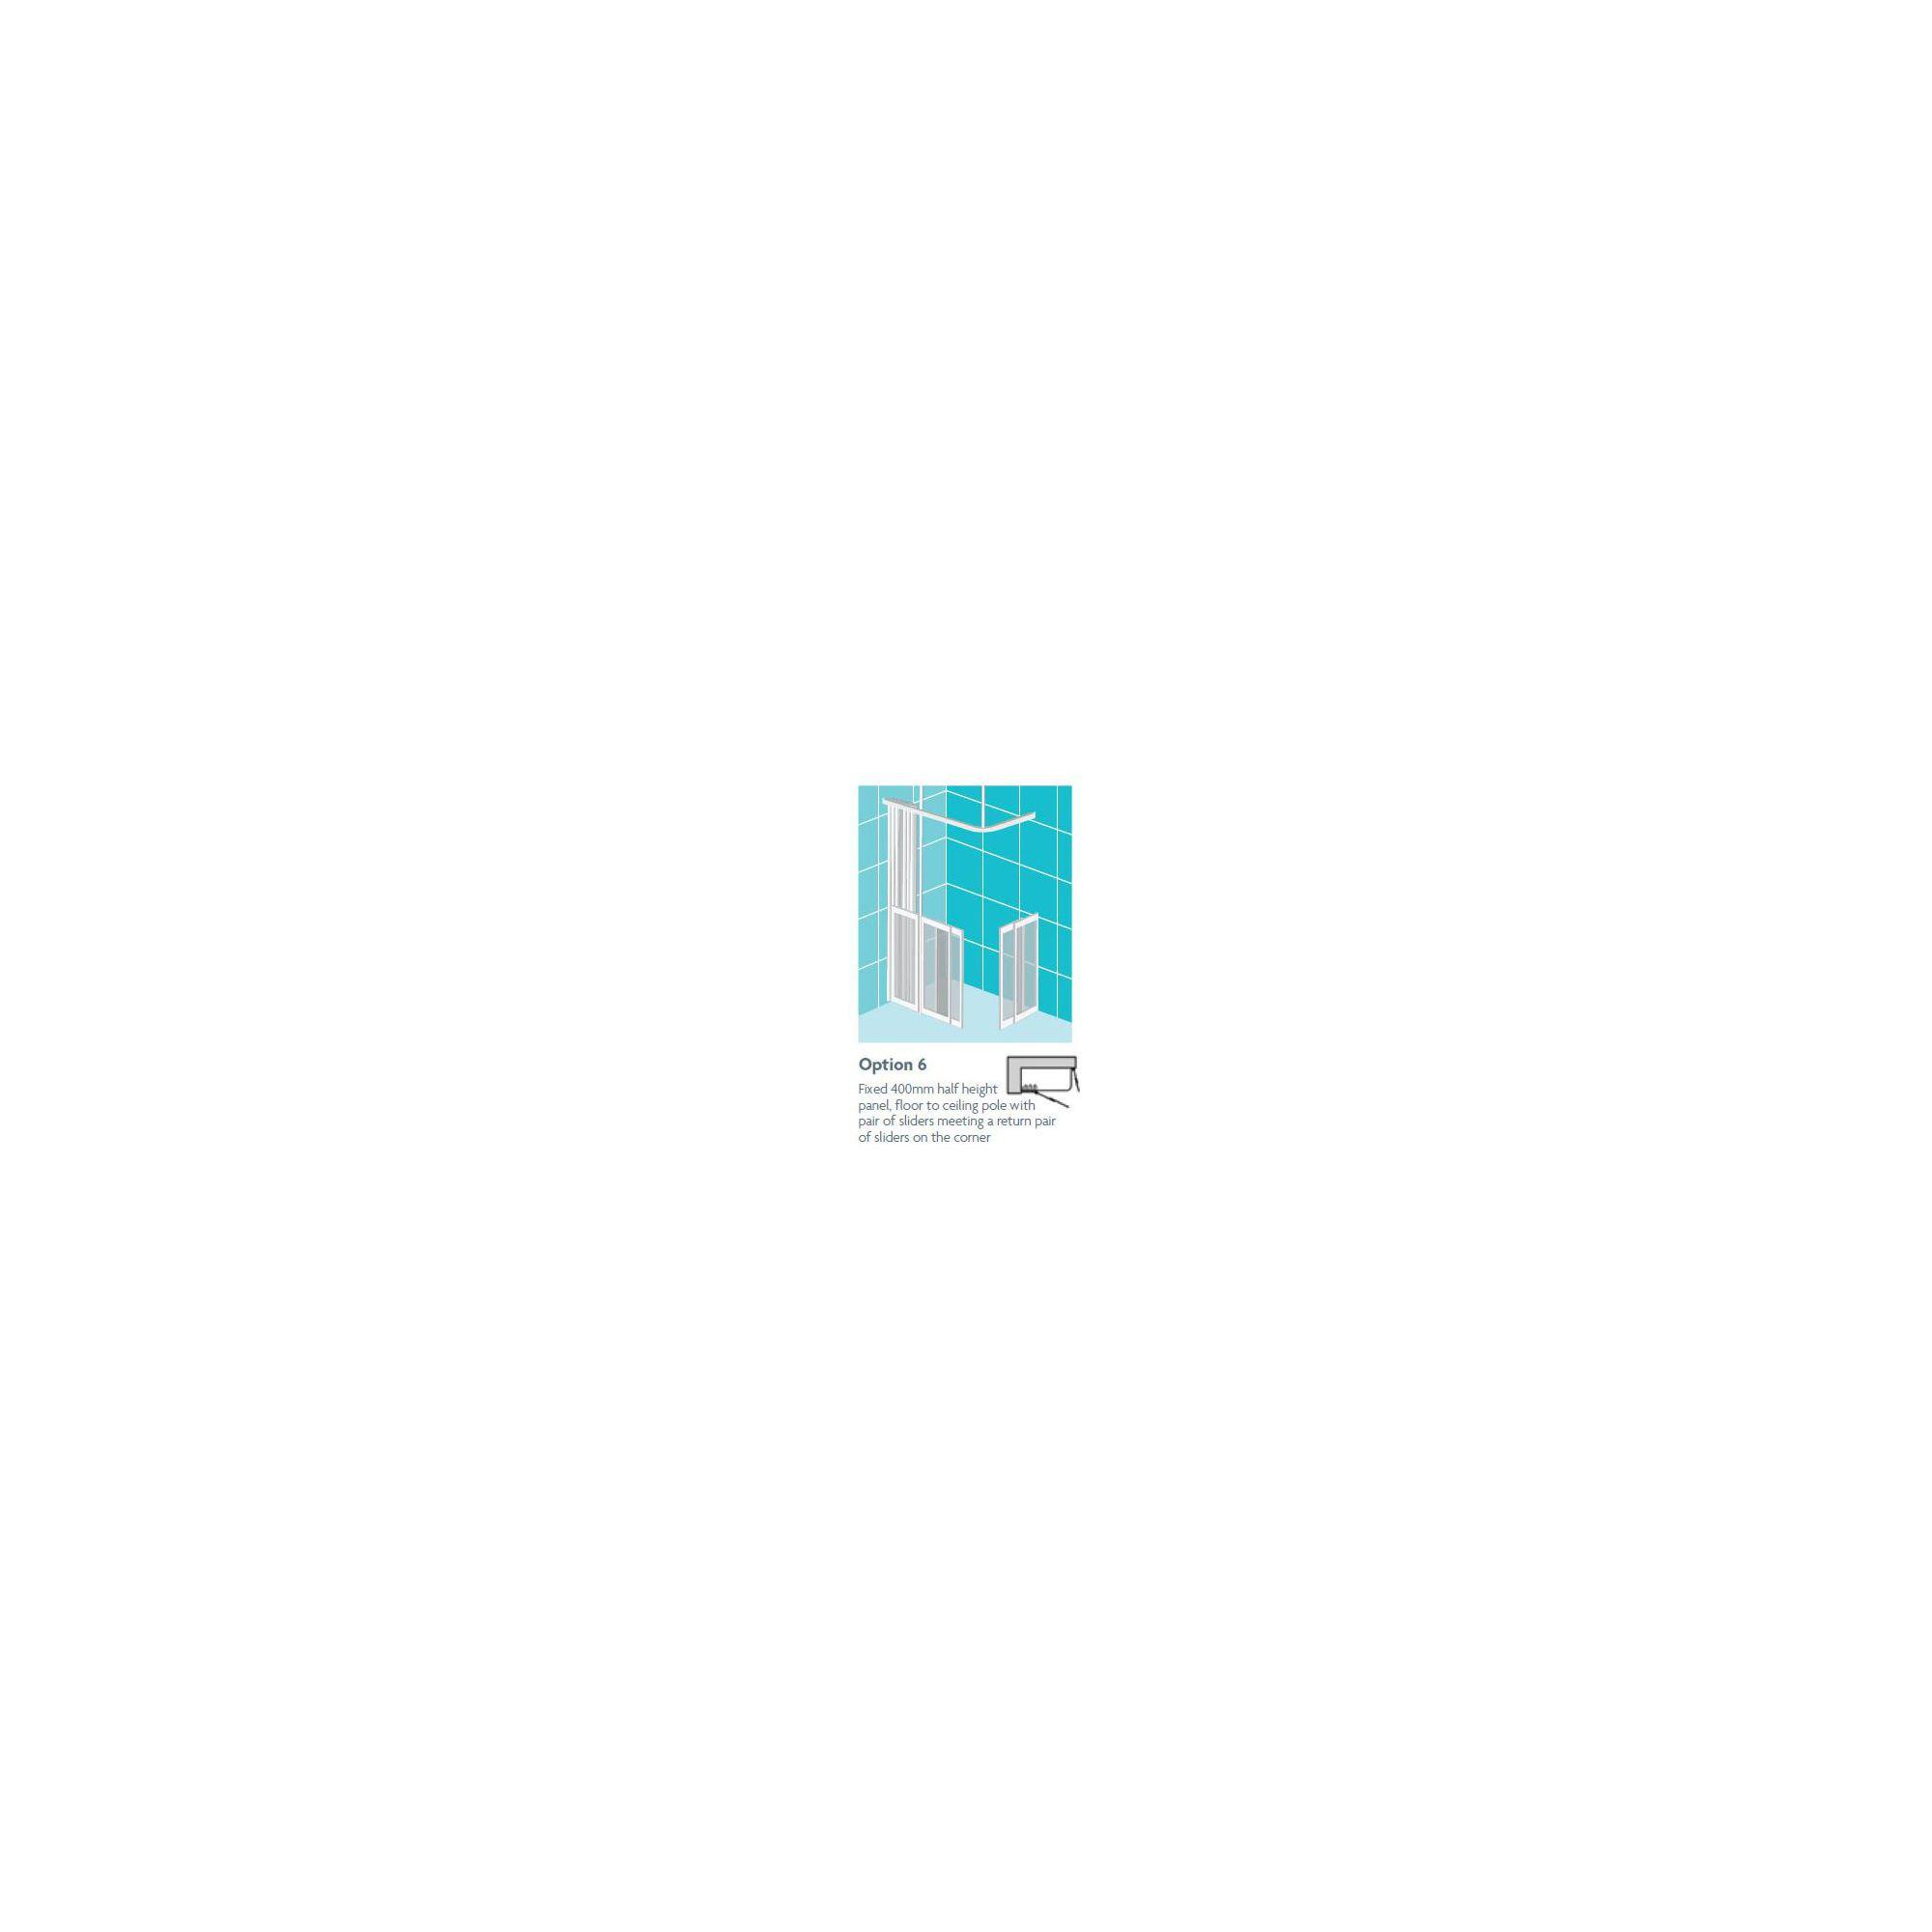 Impey Supreme Corner Door Option 6 Left Hand 1300mm x 800mm at Tescos Direct